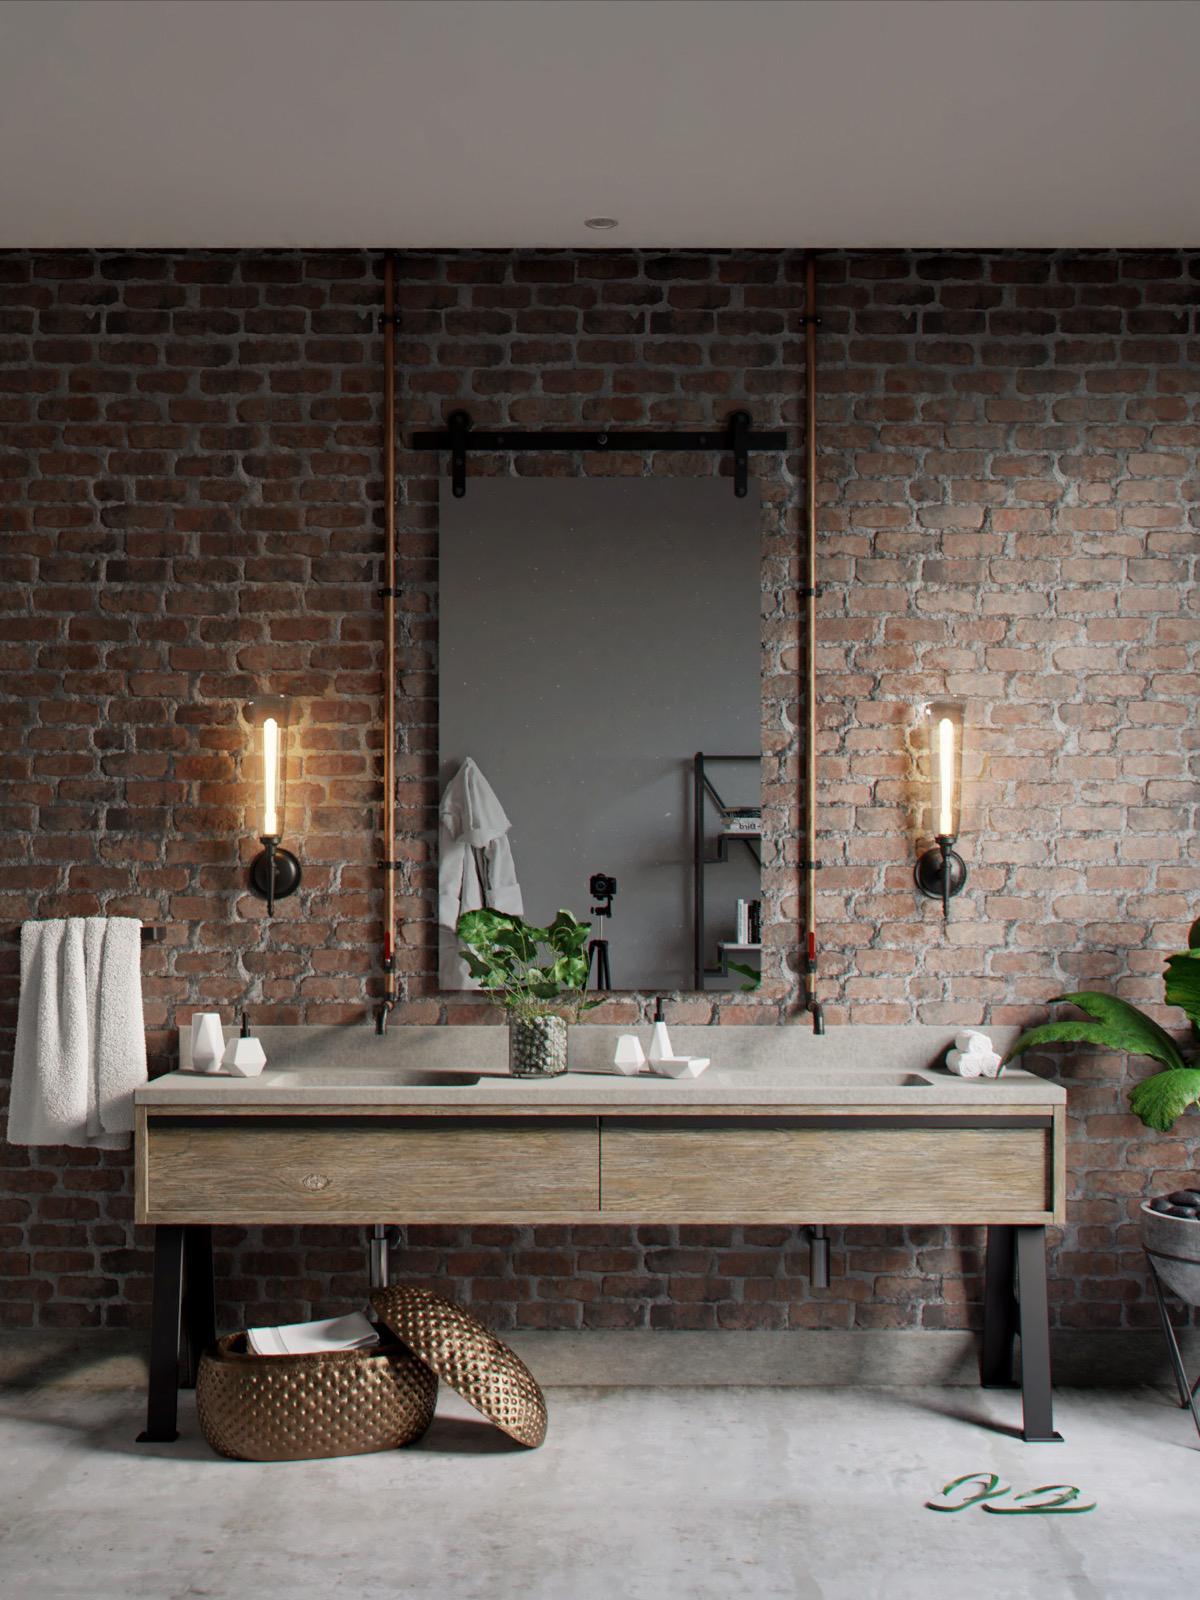 Gorgeous Industrial Bathroom Design Ideas - Talkdecor